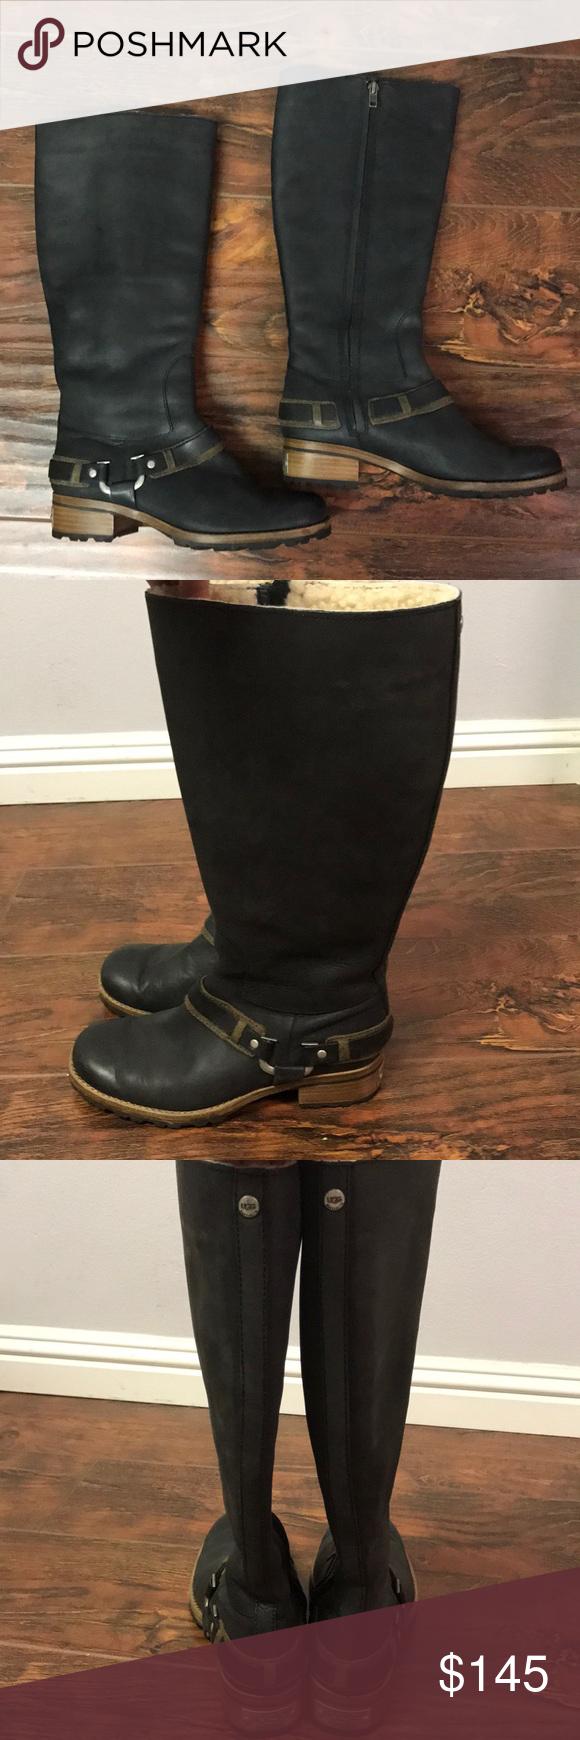 0a0481eb568 Ugg Australia boots Ugg Australia Liberty boot s/n 5509. Only worn ...